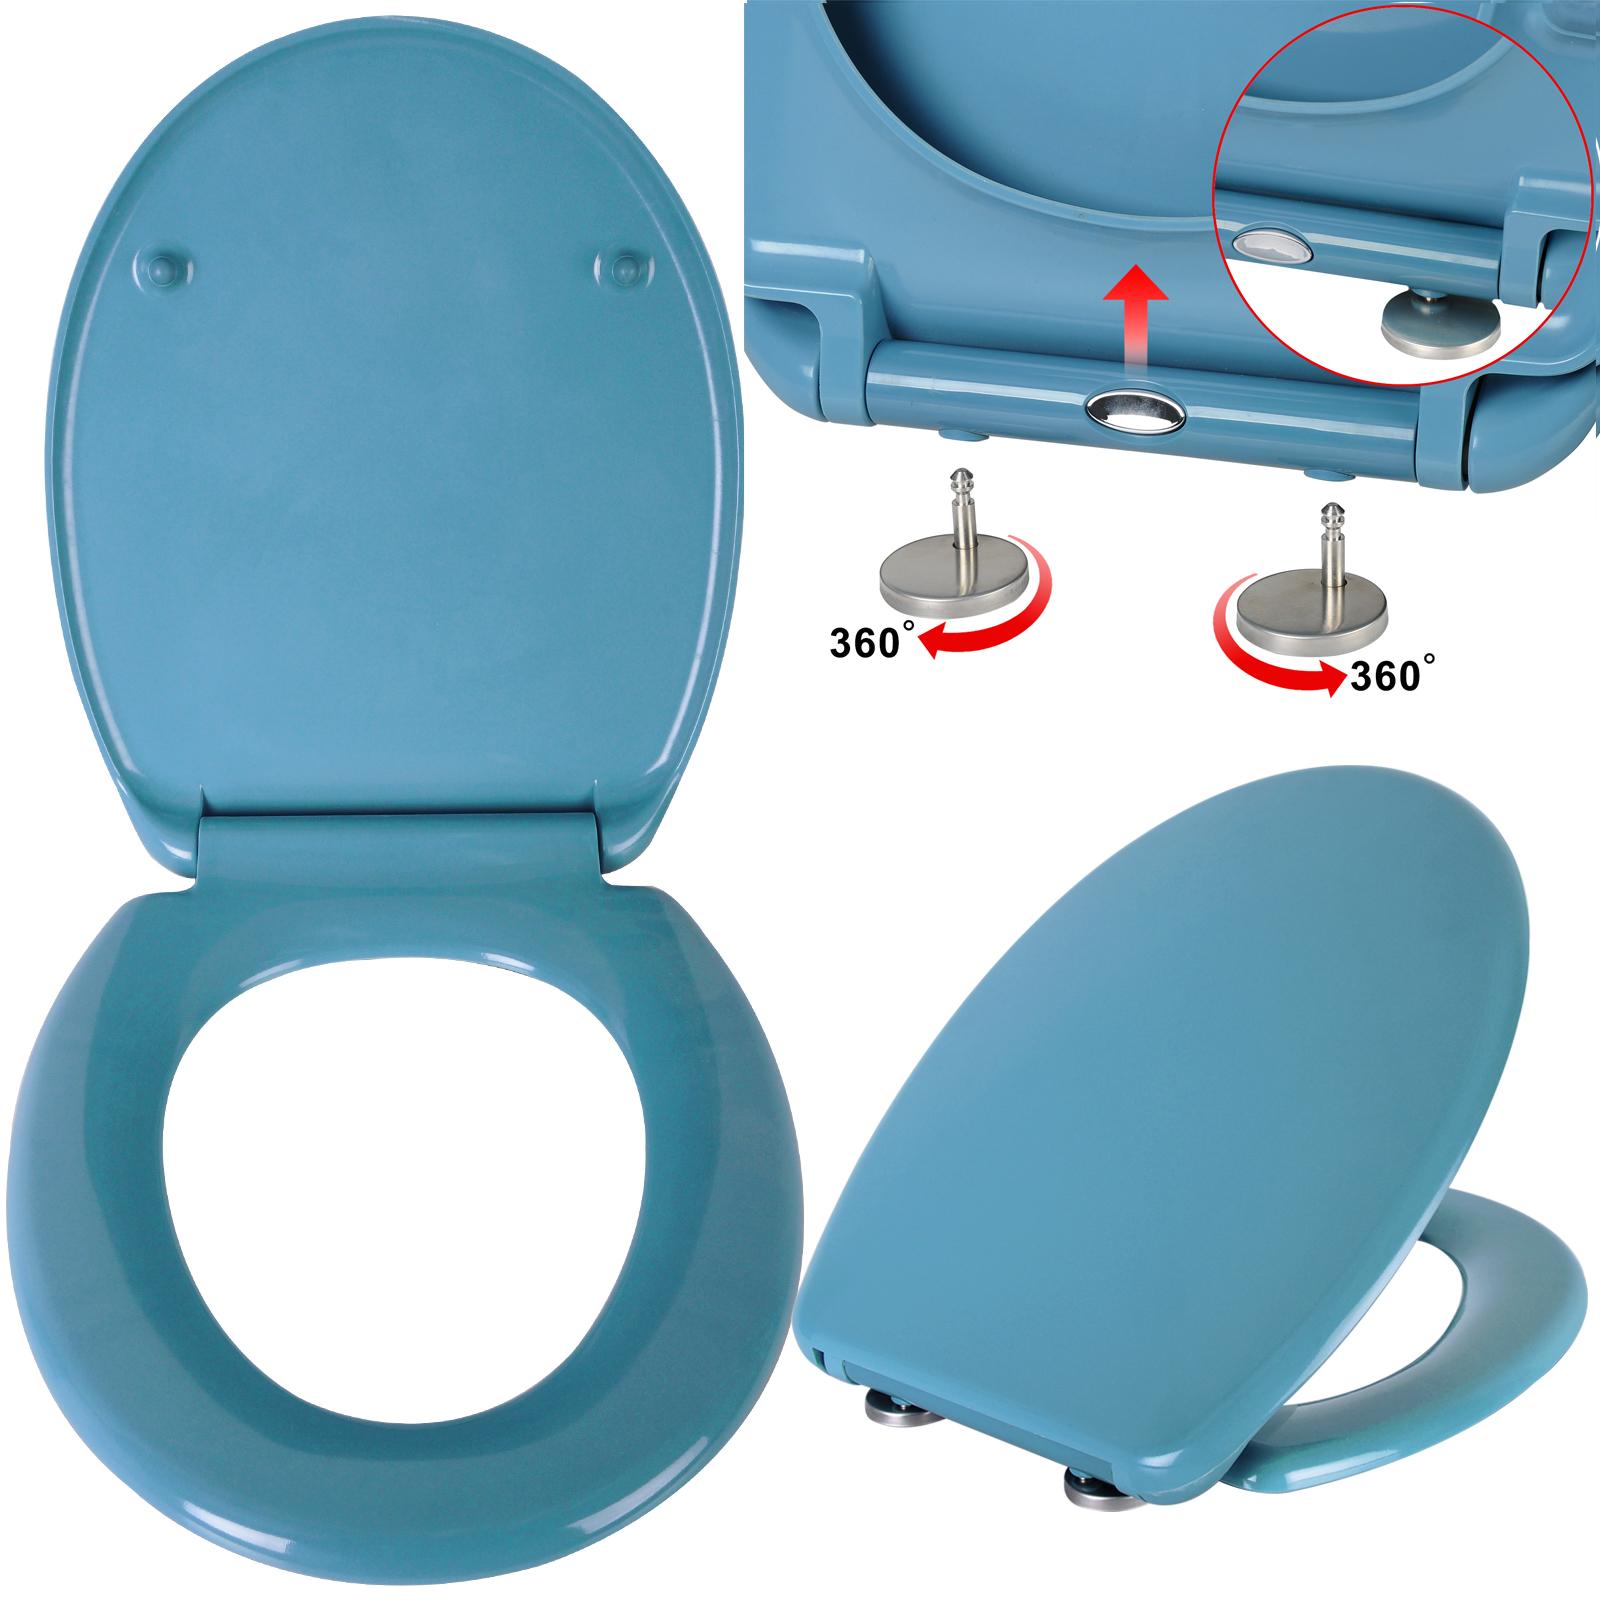 wc sitz toilettensitz toilettendeckel duroplast absenkautomatik klodeckel ws2594 ebay. Black Bedroom Furniture Sets. Home Design Ideas